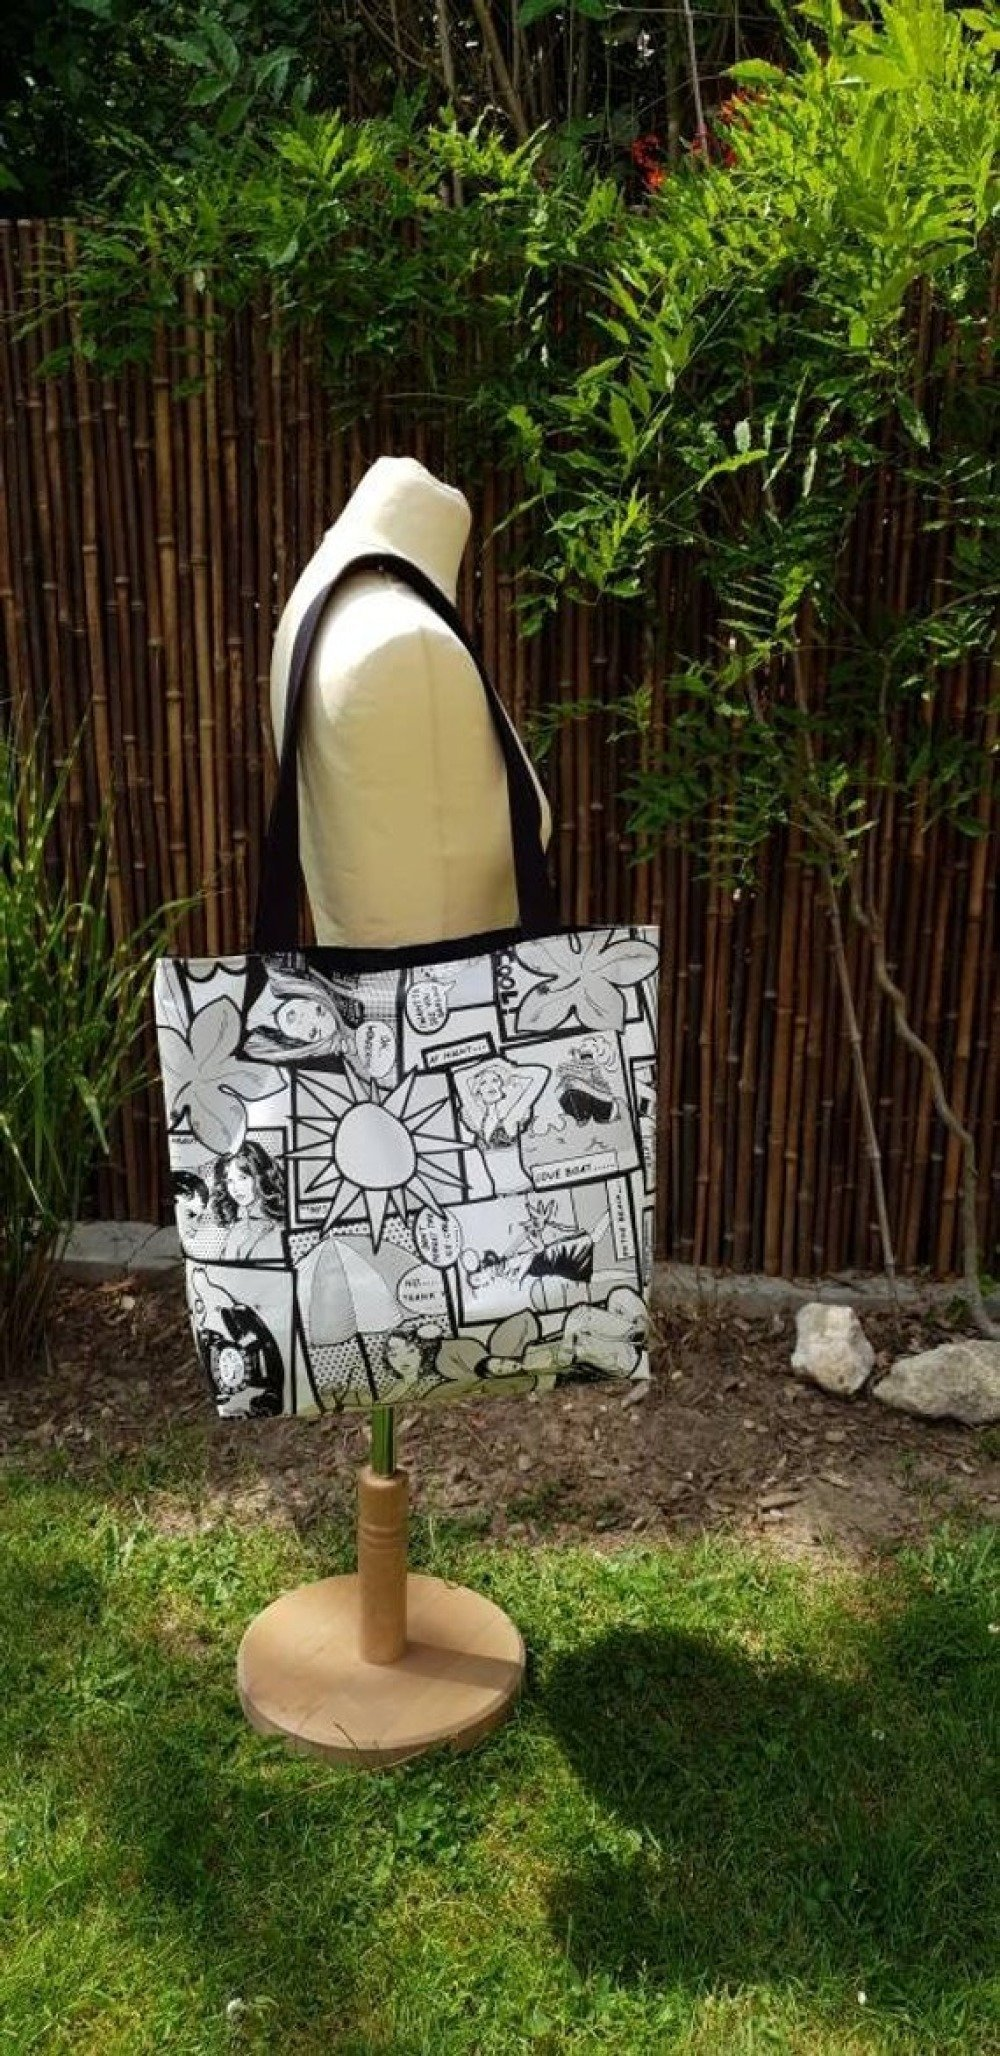 Sac cabas , sac plage - bd, comics - sac en coton enduit